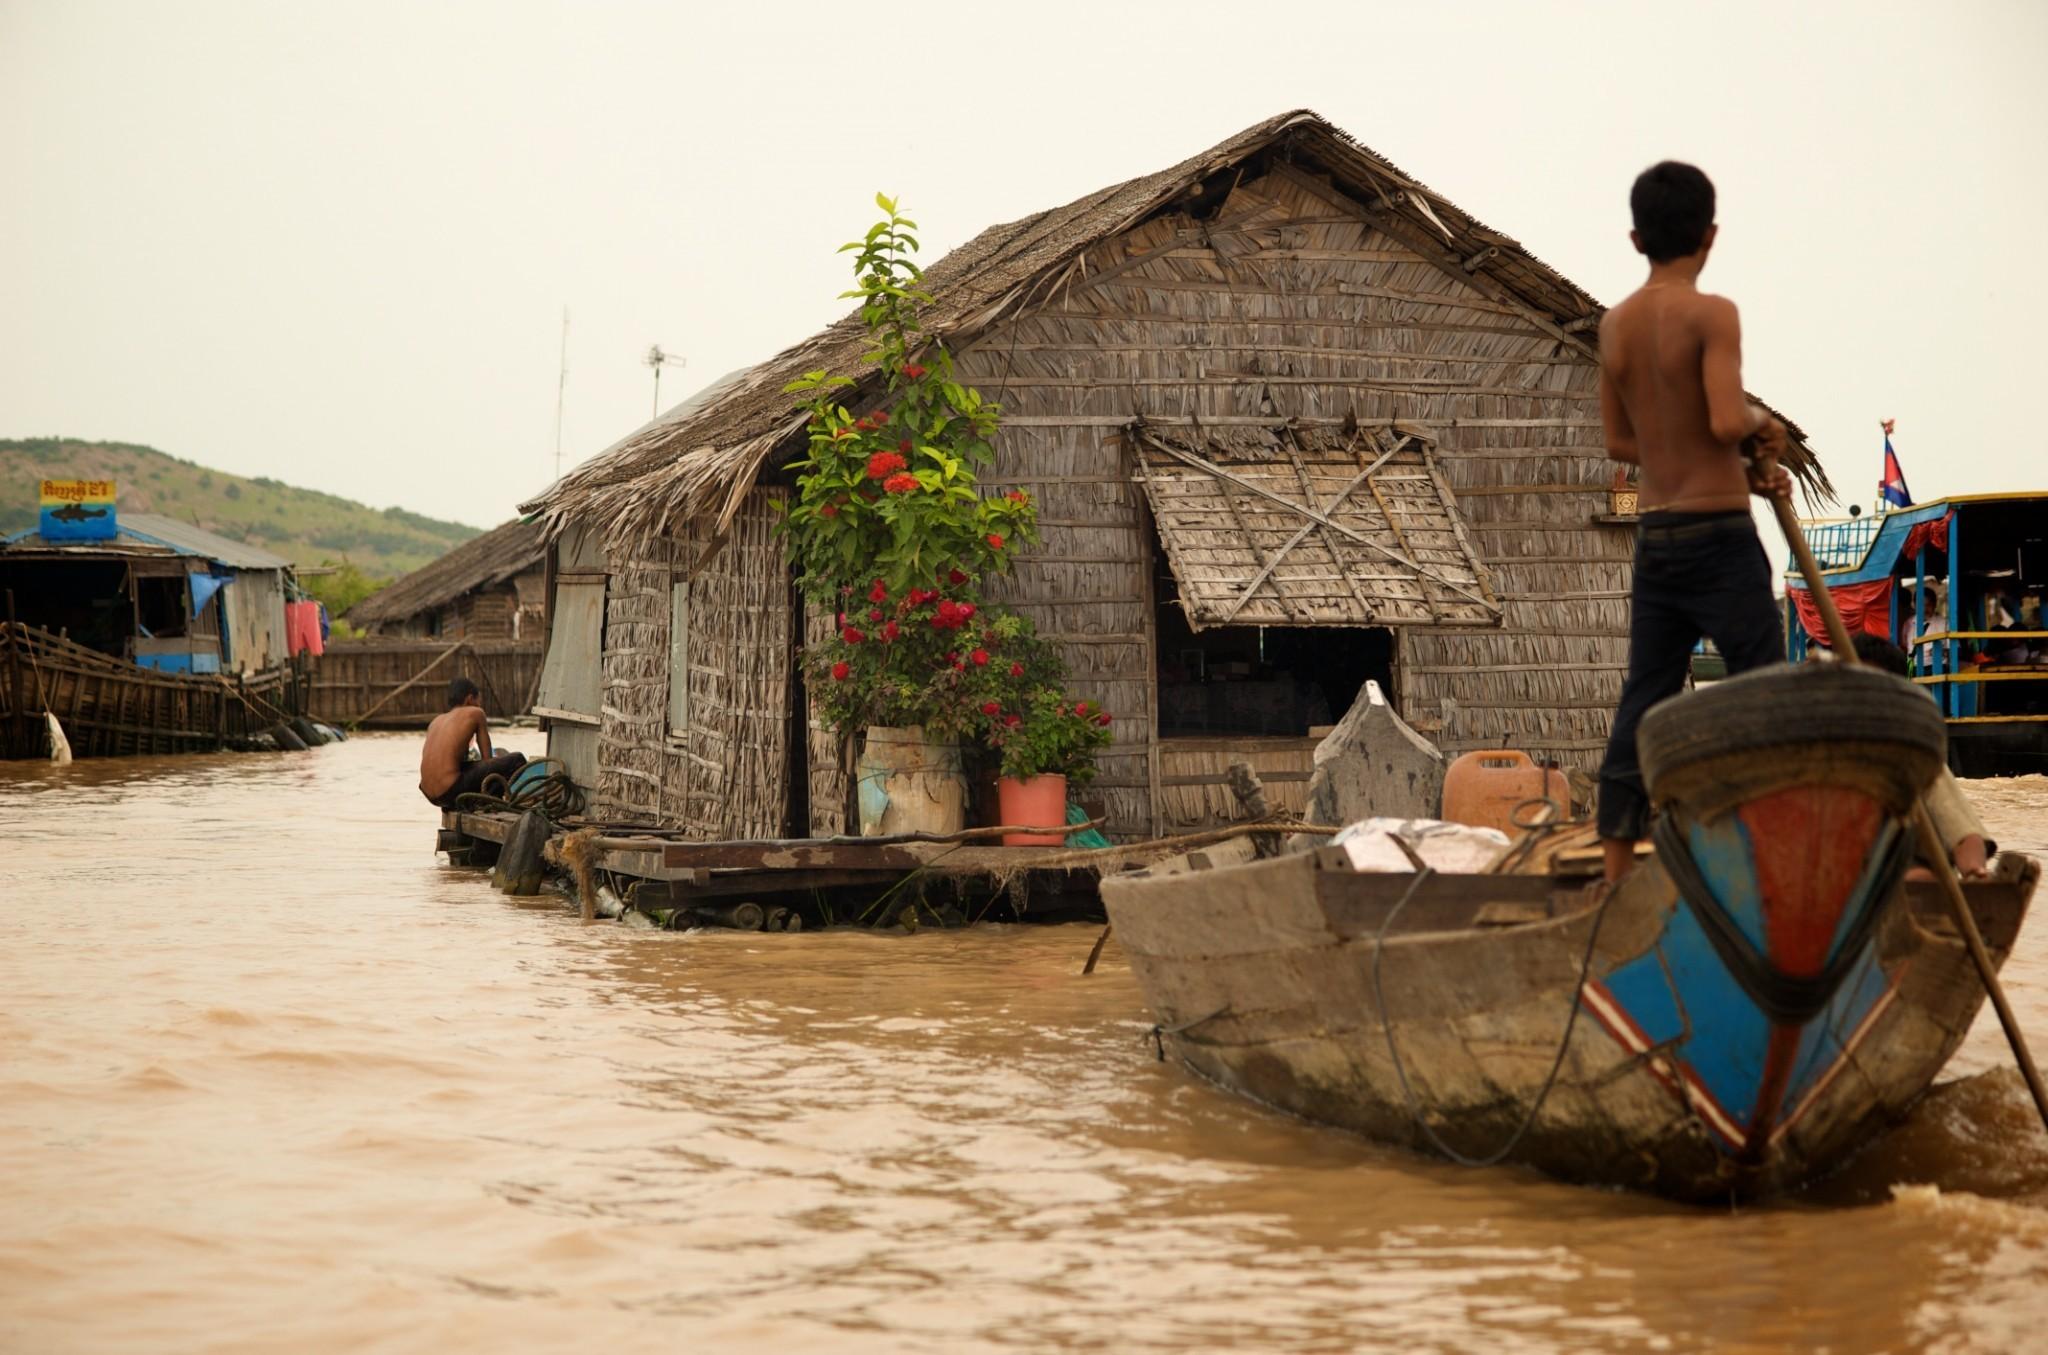 AlexSoh_July09 Cambodia068